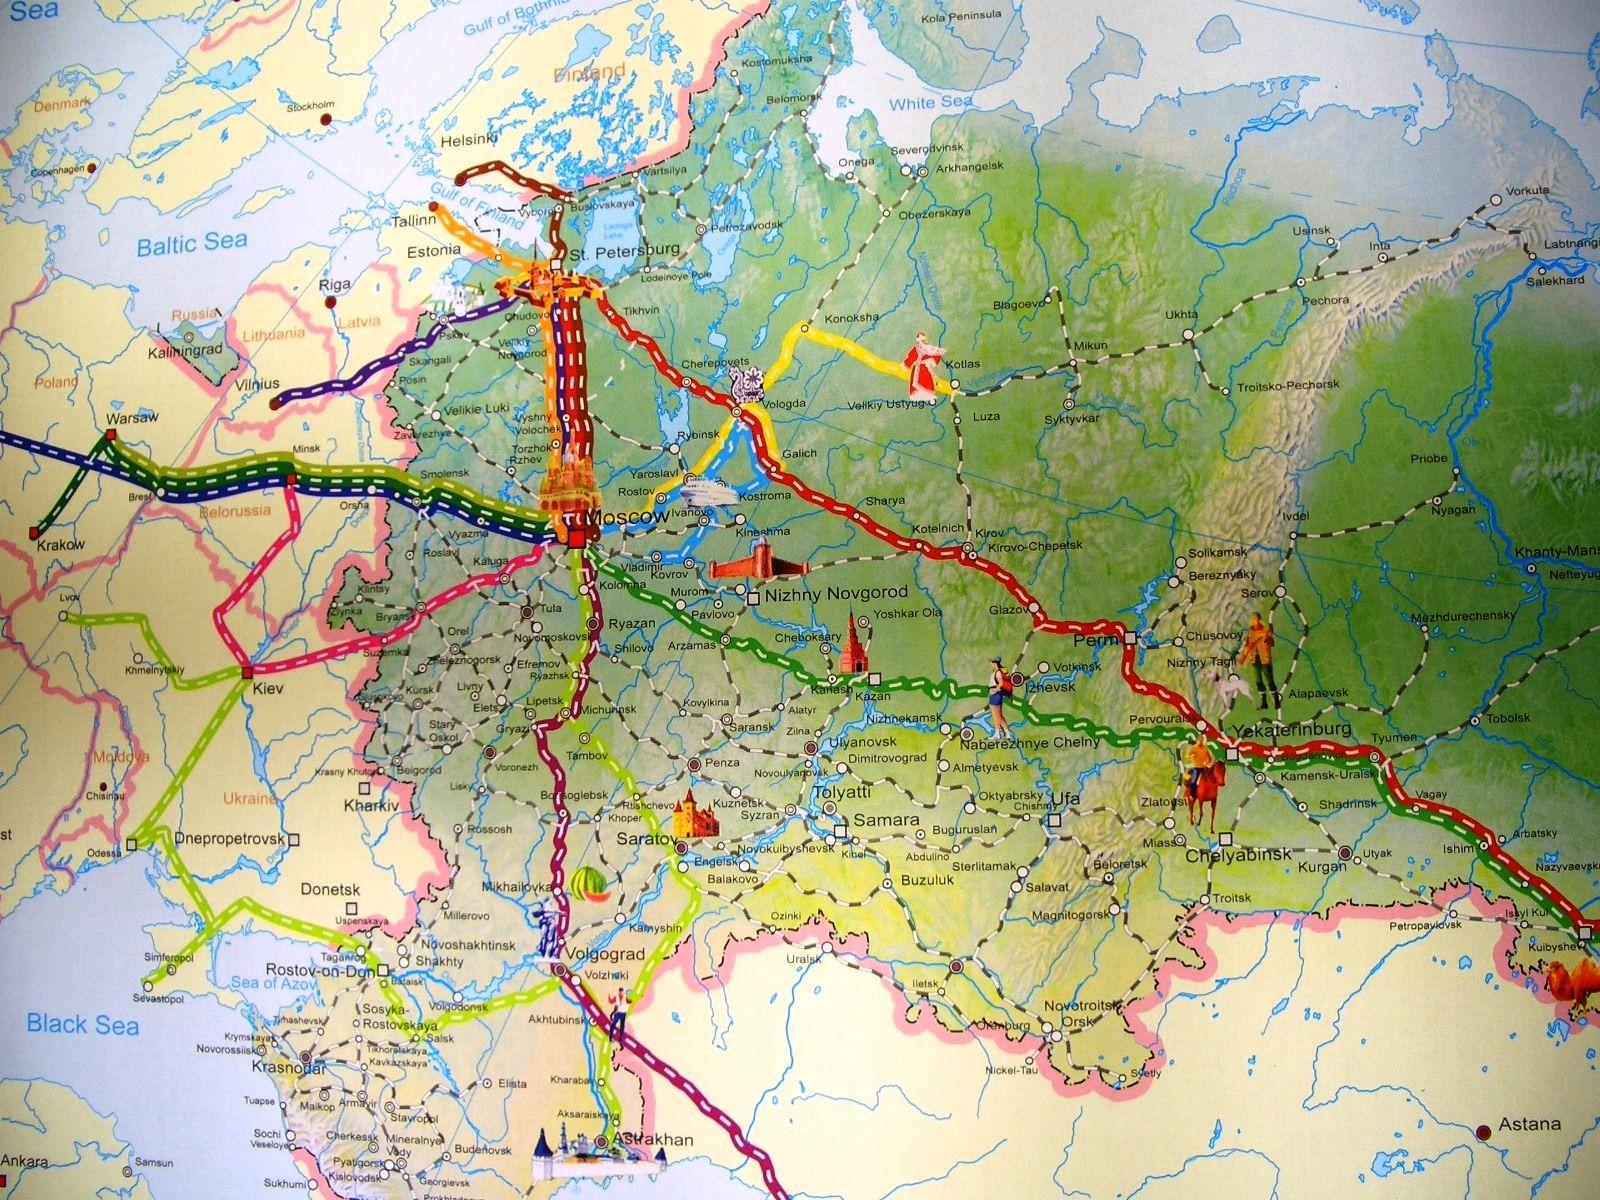 eisenbahn russland easternmost europe 39 15 pinterest. Black Bedroom Furniture Sets. Home Design Ideas